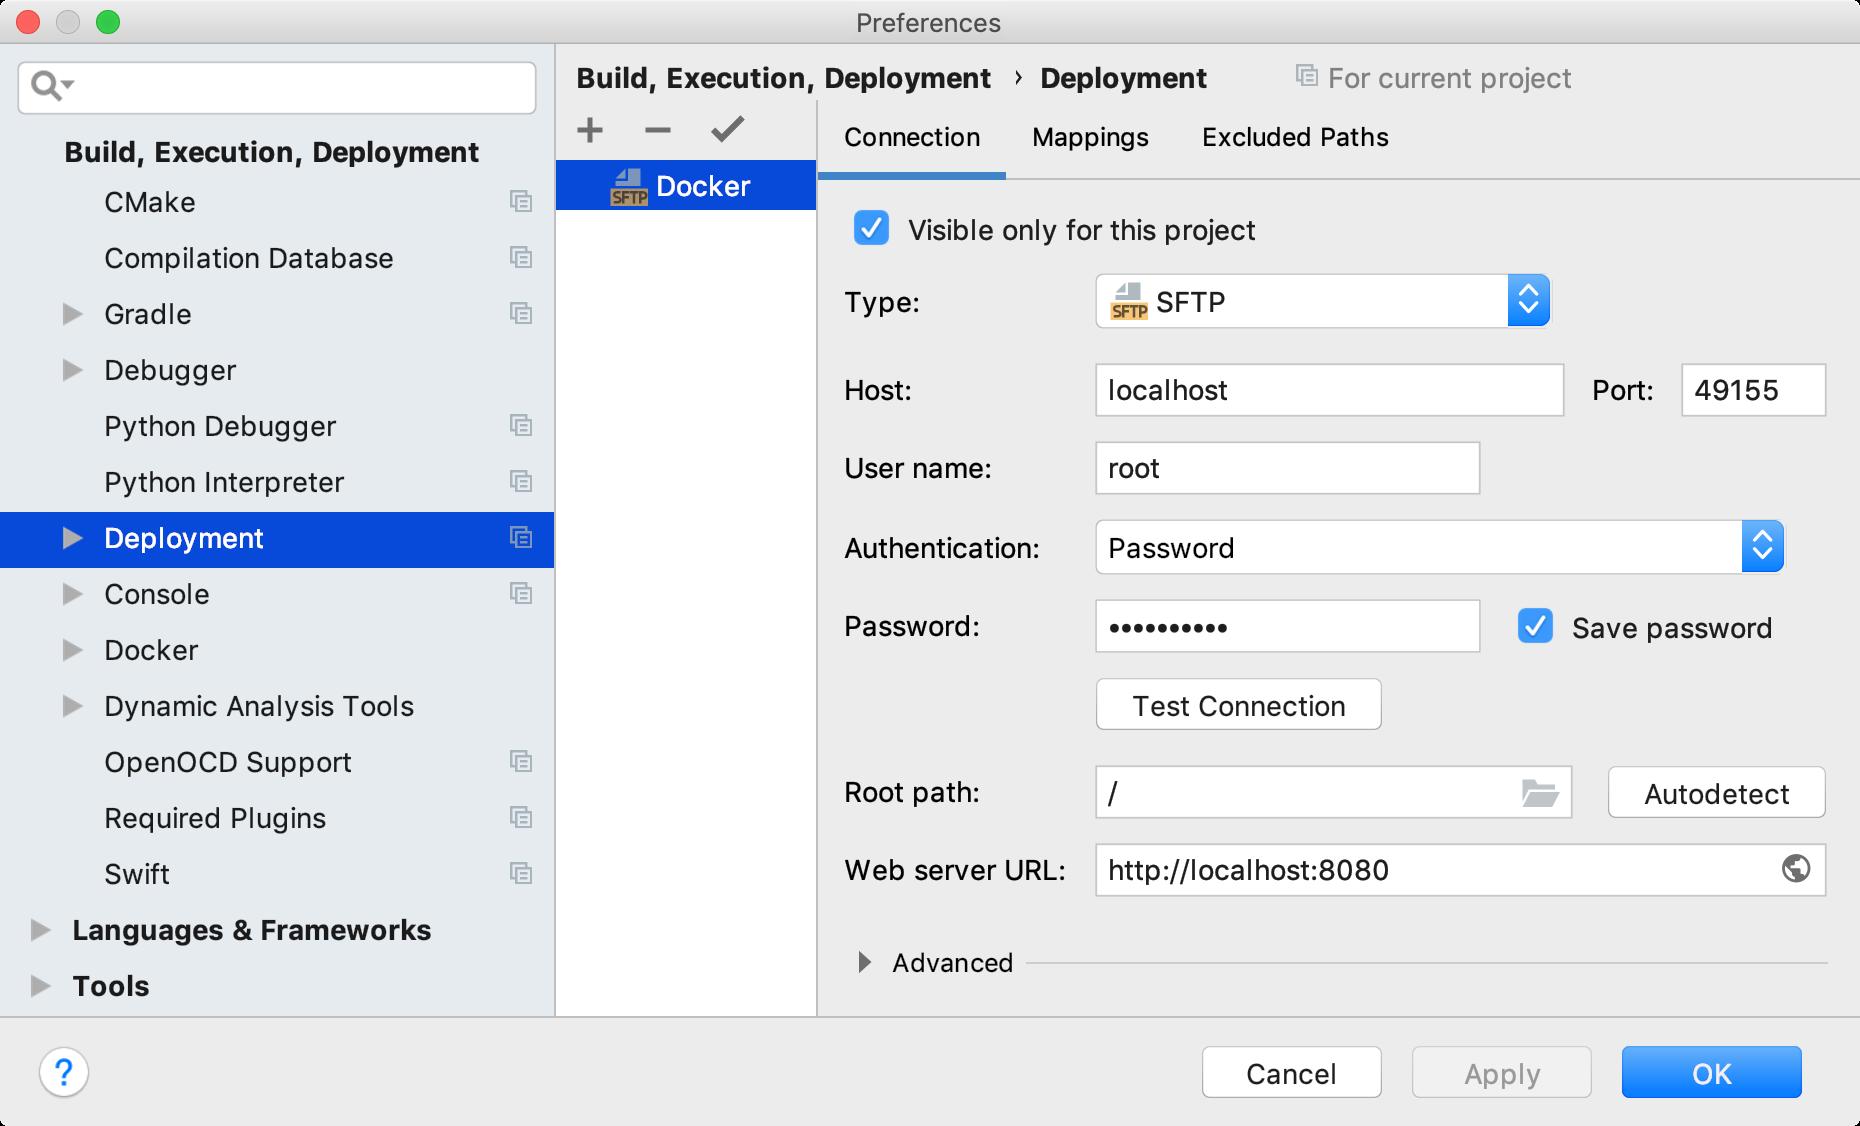 Remote host preferences